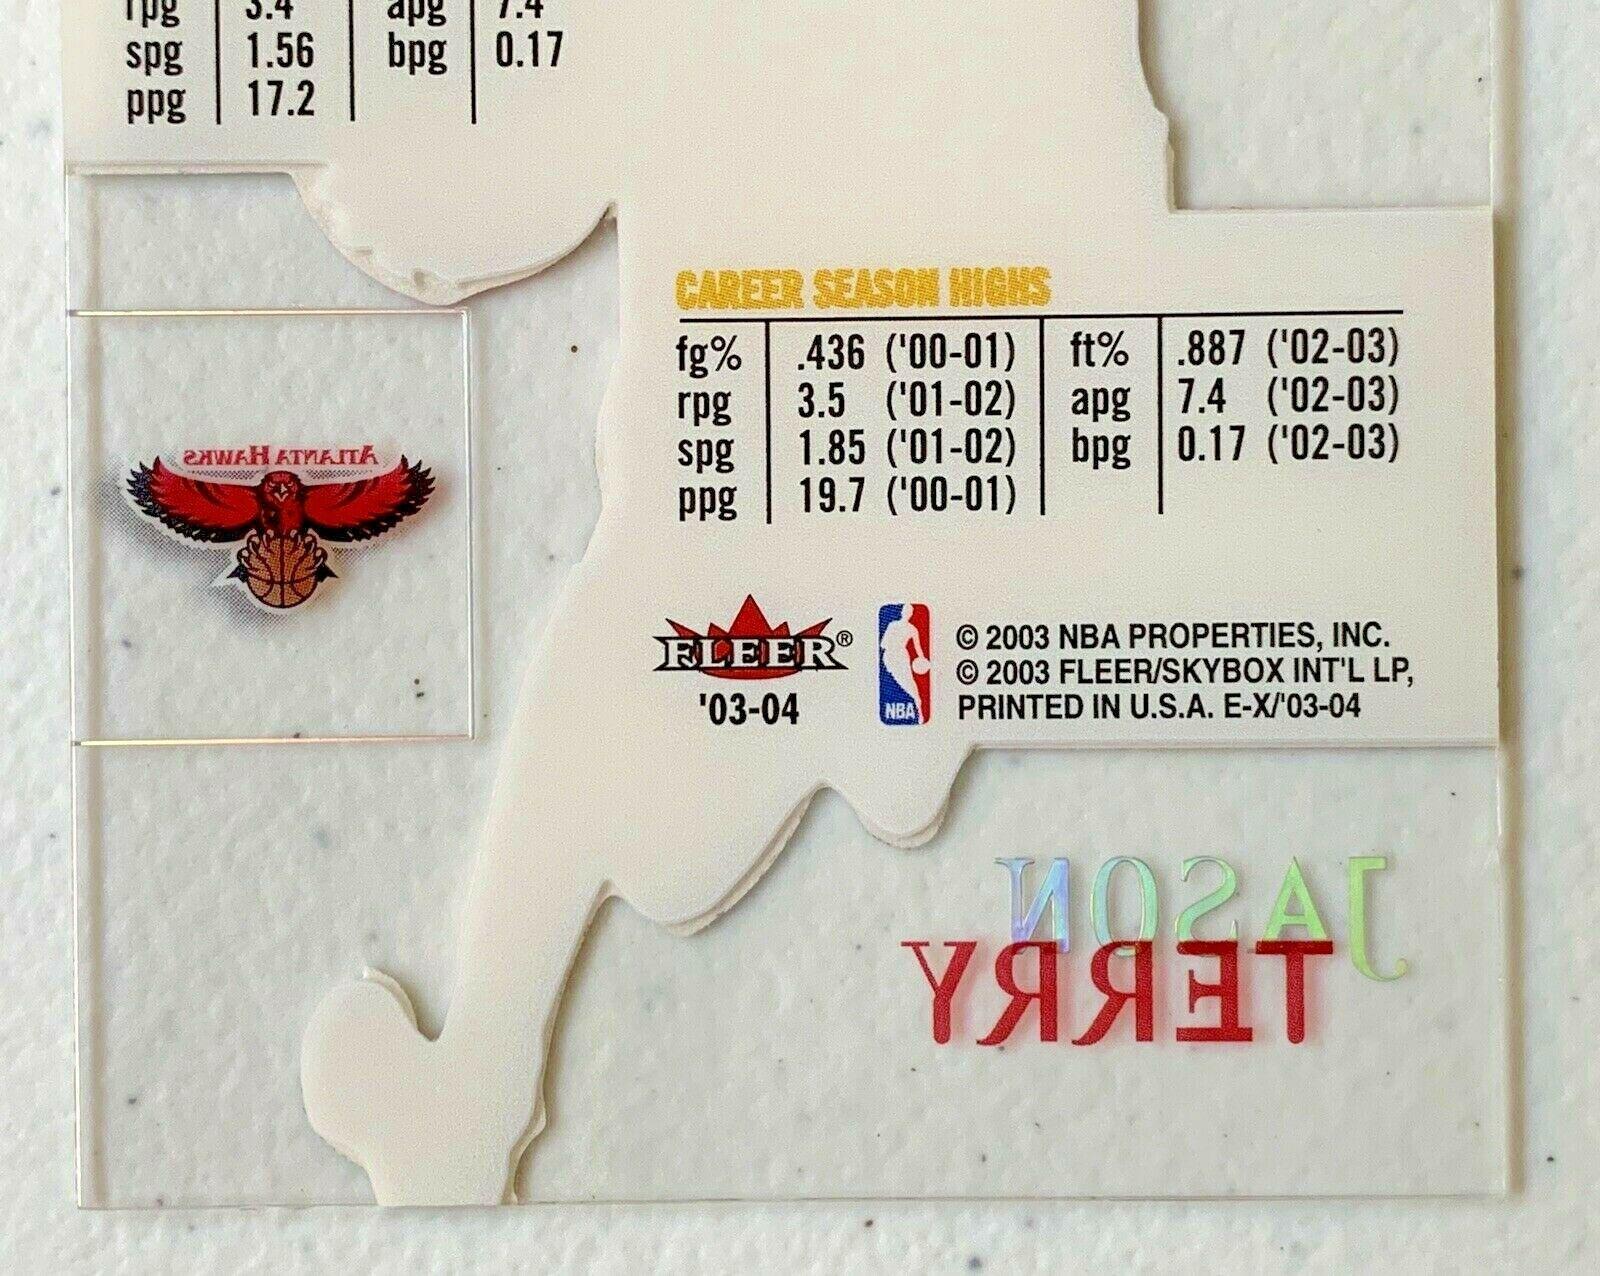 Jason Terry Now/66 #65 Atlanta Hawks Fleer Basketball Card with Hard Case 31G image 9